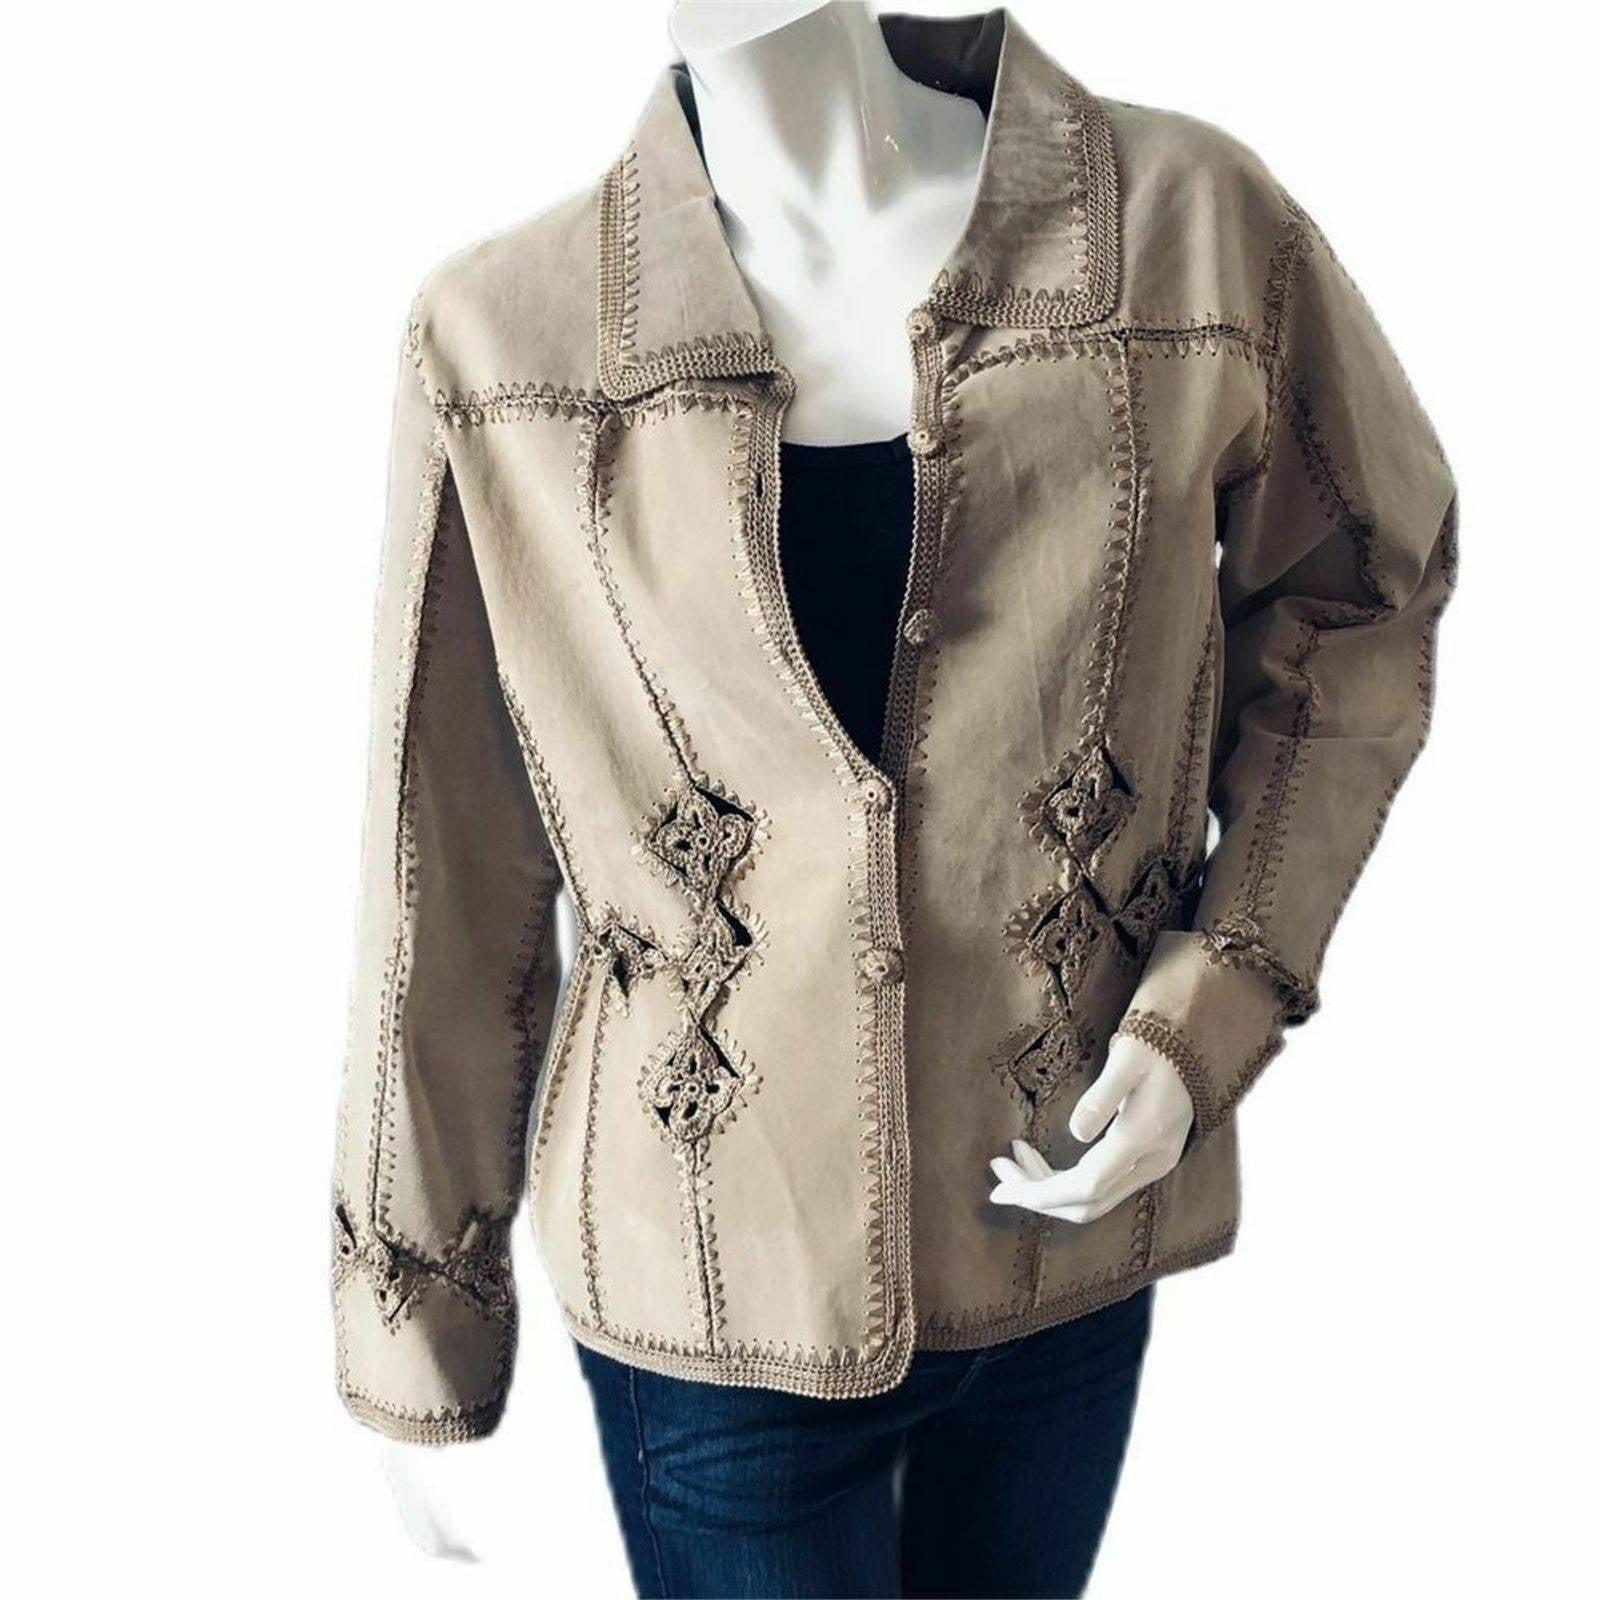 Carducci Suede Leather Crochet Jacket